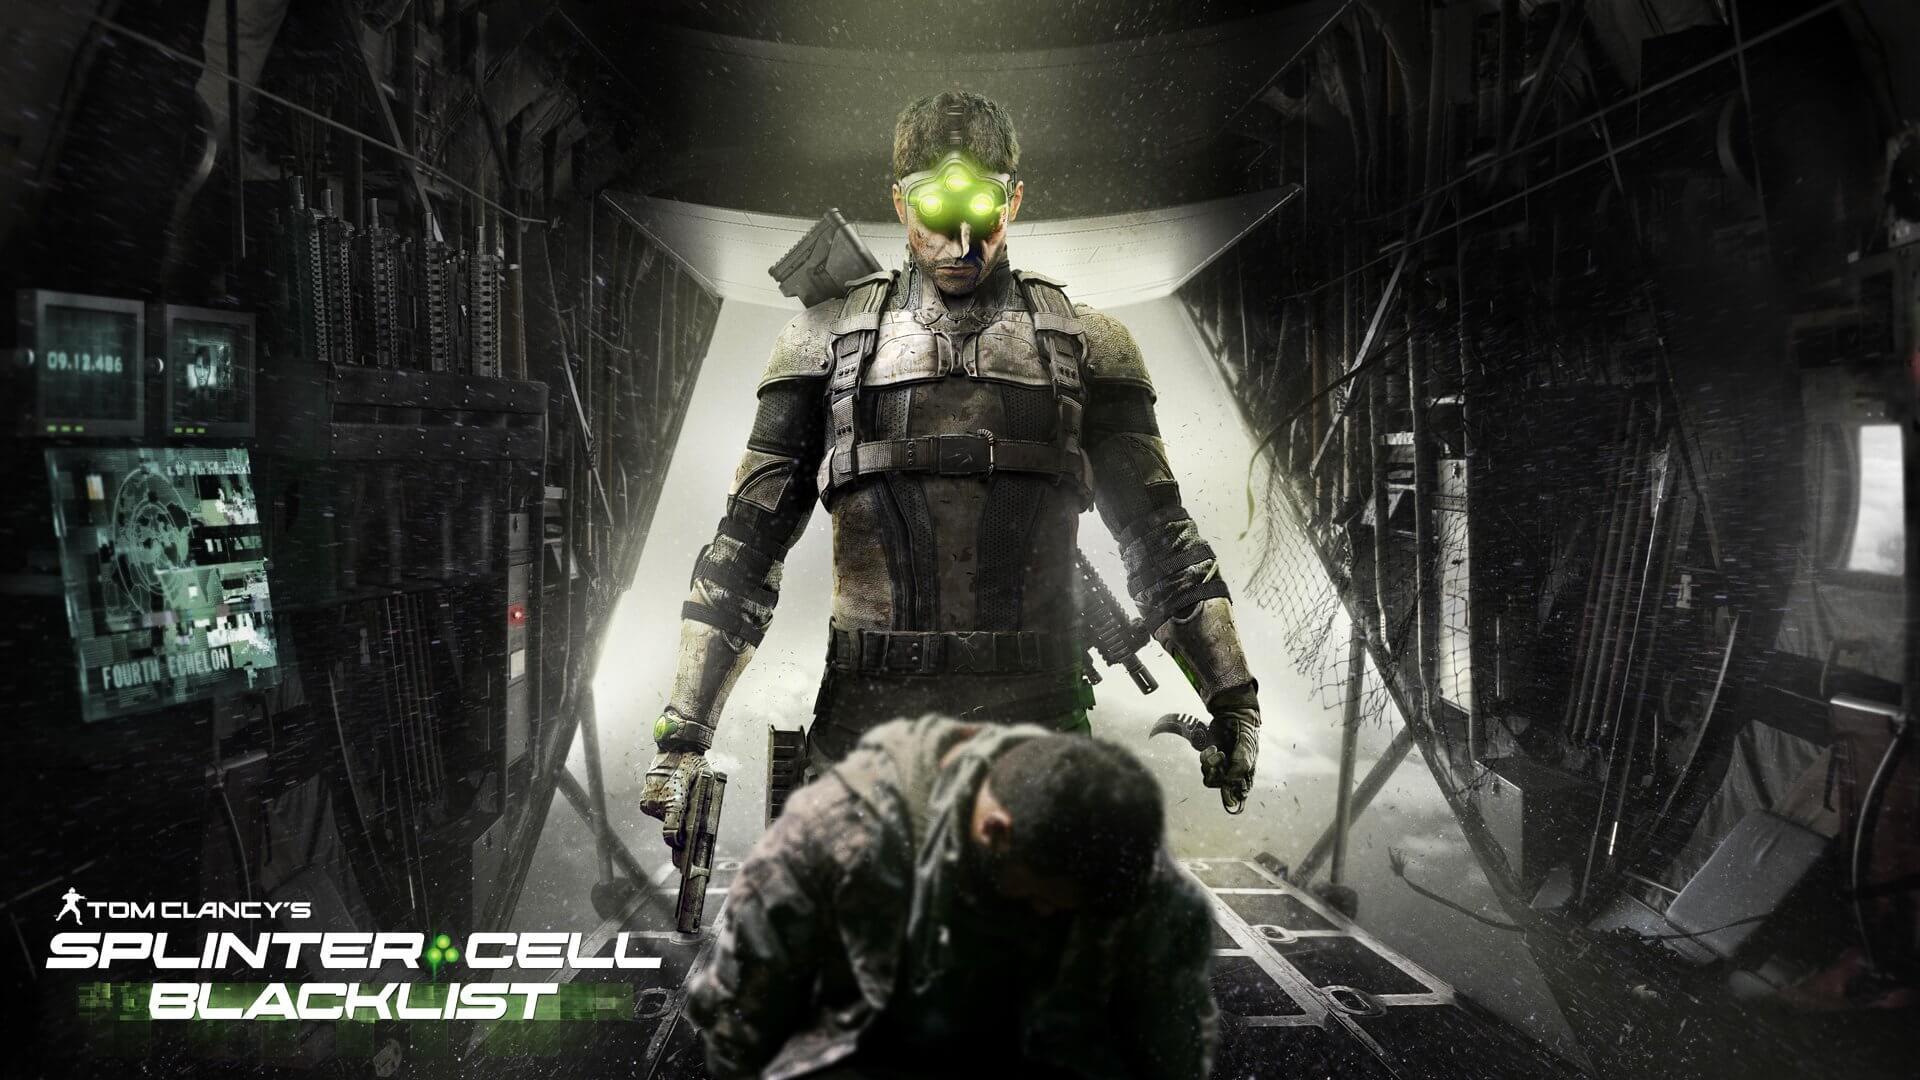 Splinter Cell Blacklist Collectibles Locations Guide